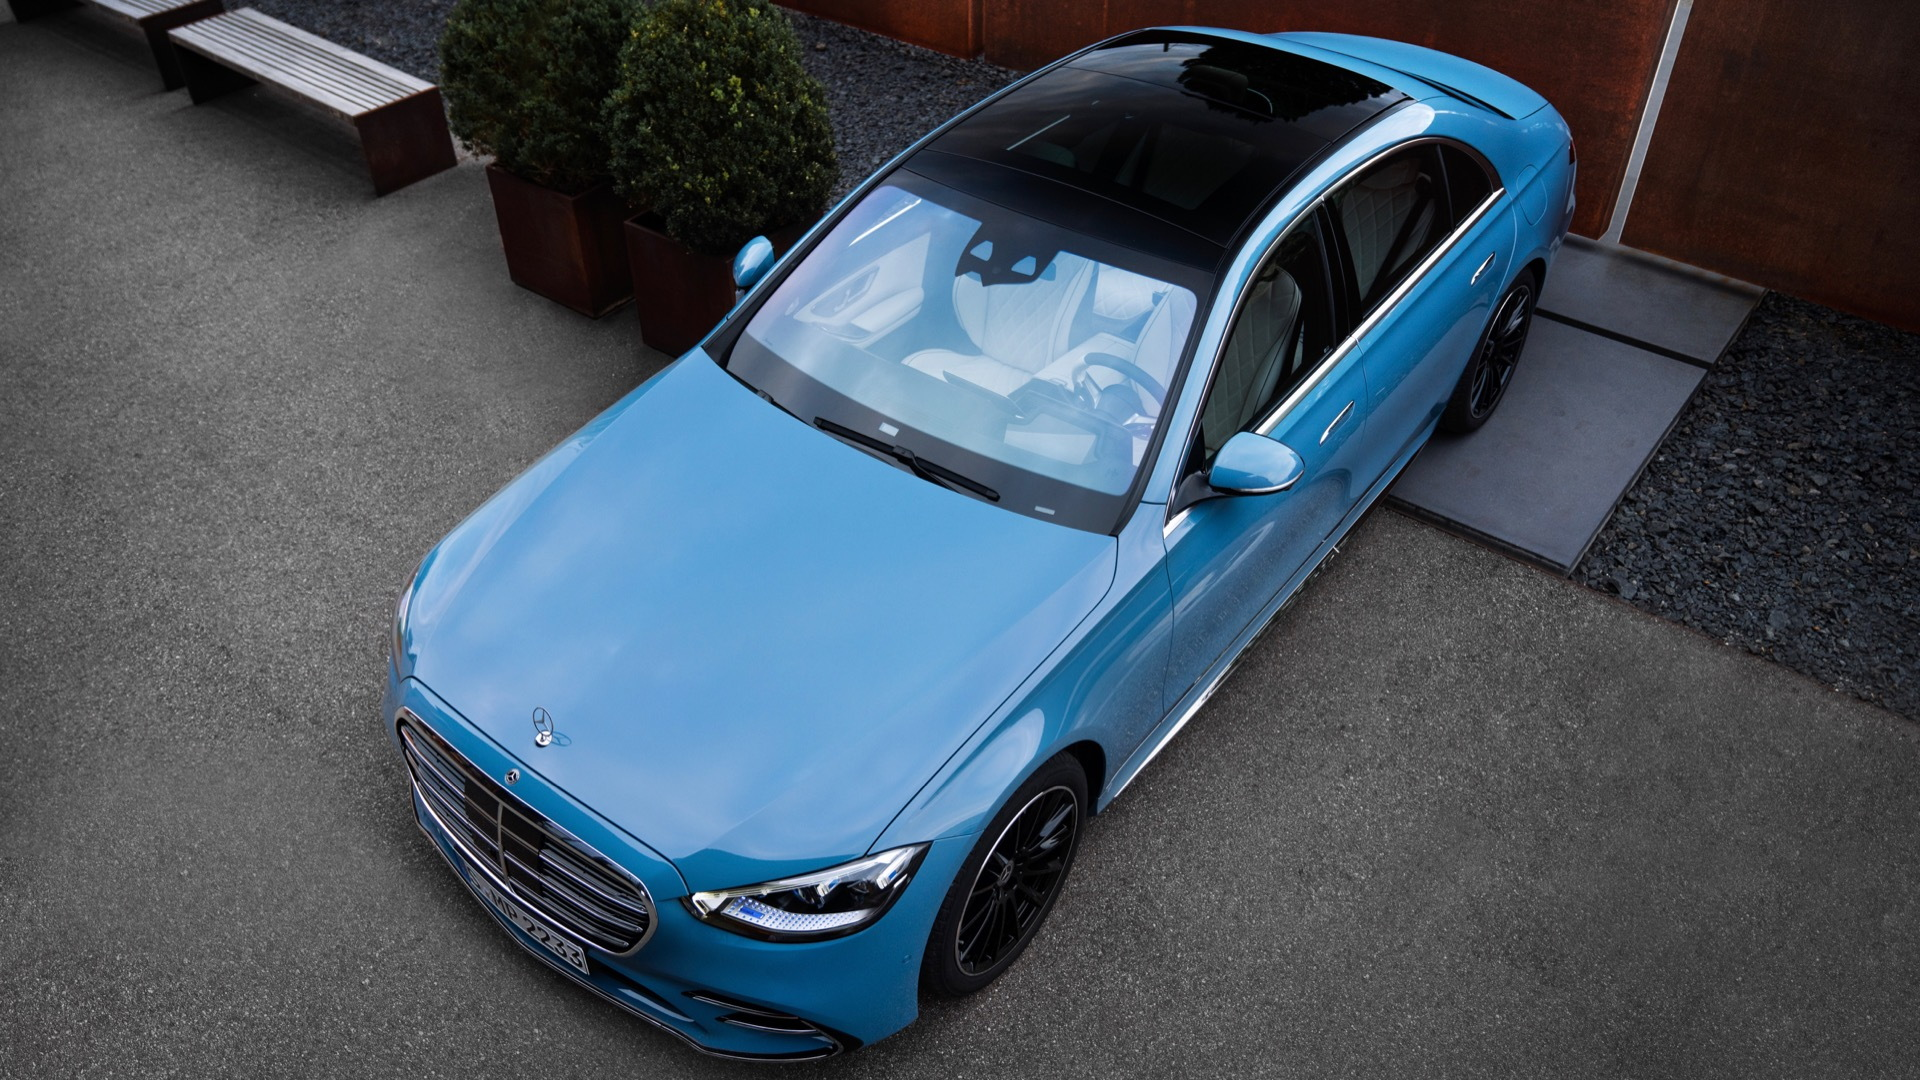 Mercedes-Benz S-Class with Manufaktur options